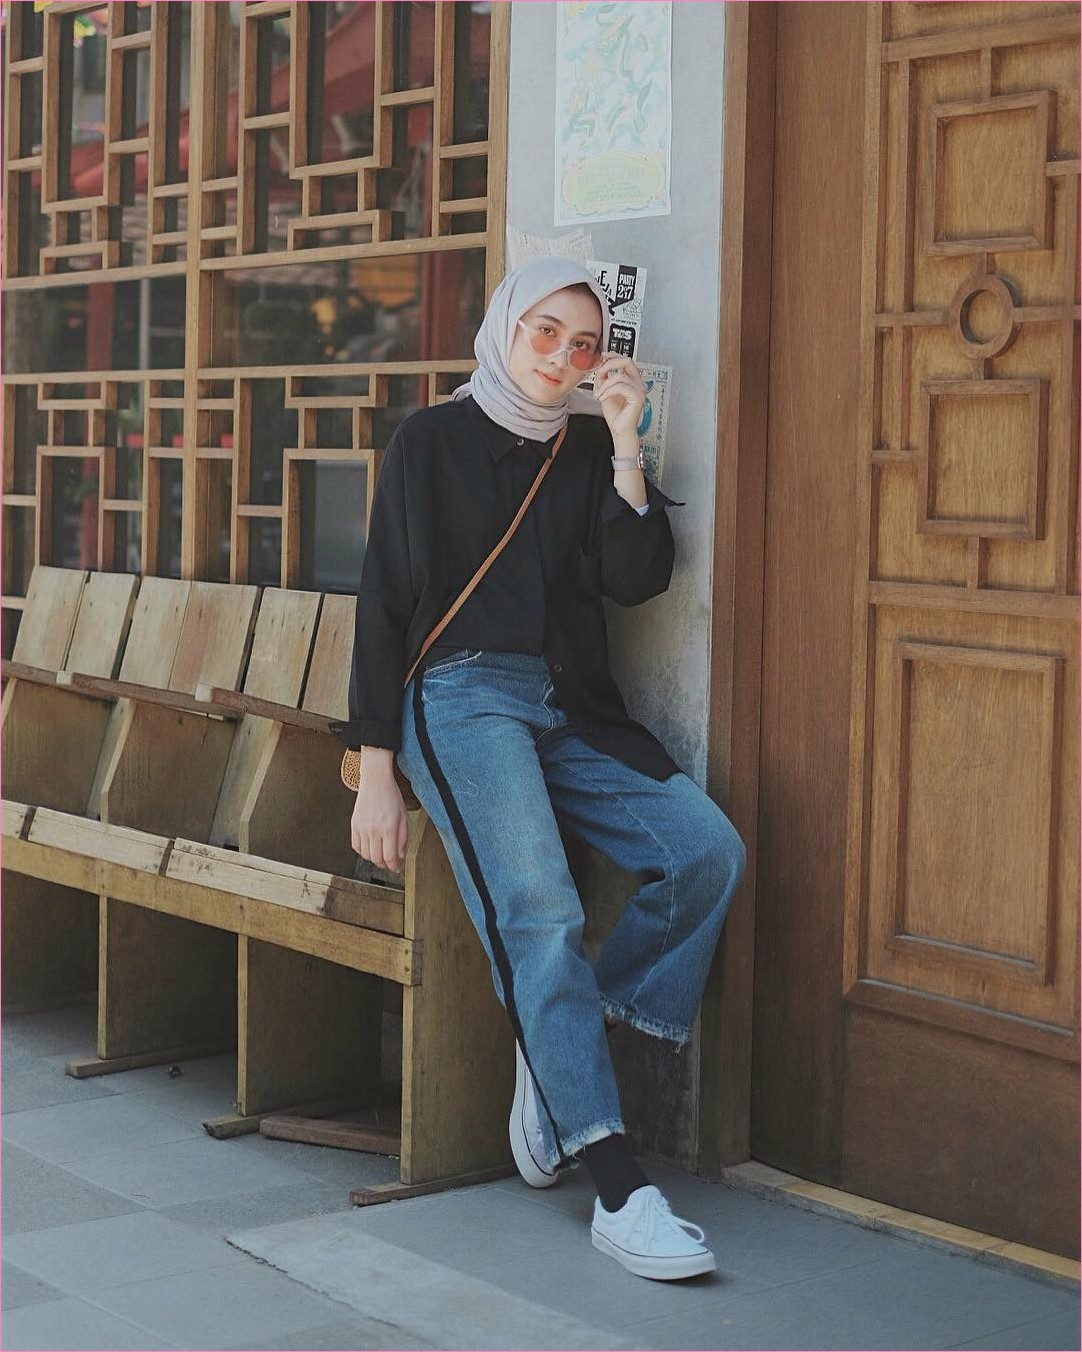 Outfit Baju Hijab Casual Untuk Kuliah Ala Selebgram 2018 sneakers kets putih jeans pallazo cullotes sobek denim kaos kaki top blouse kemeja hitam sling bags rotan hijab square kerudung segiempat krem kacamata orange muda gaya casual kain katun sutra rayon ootd 2018 outfit selebgram